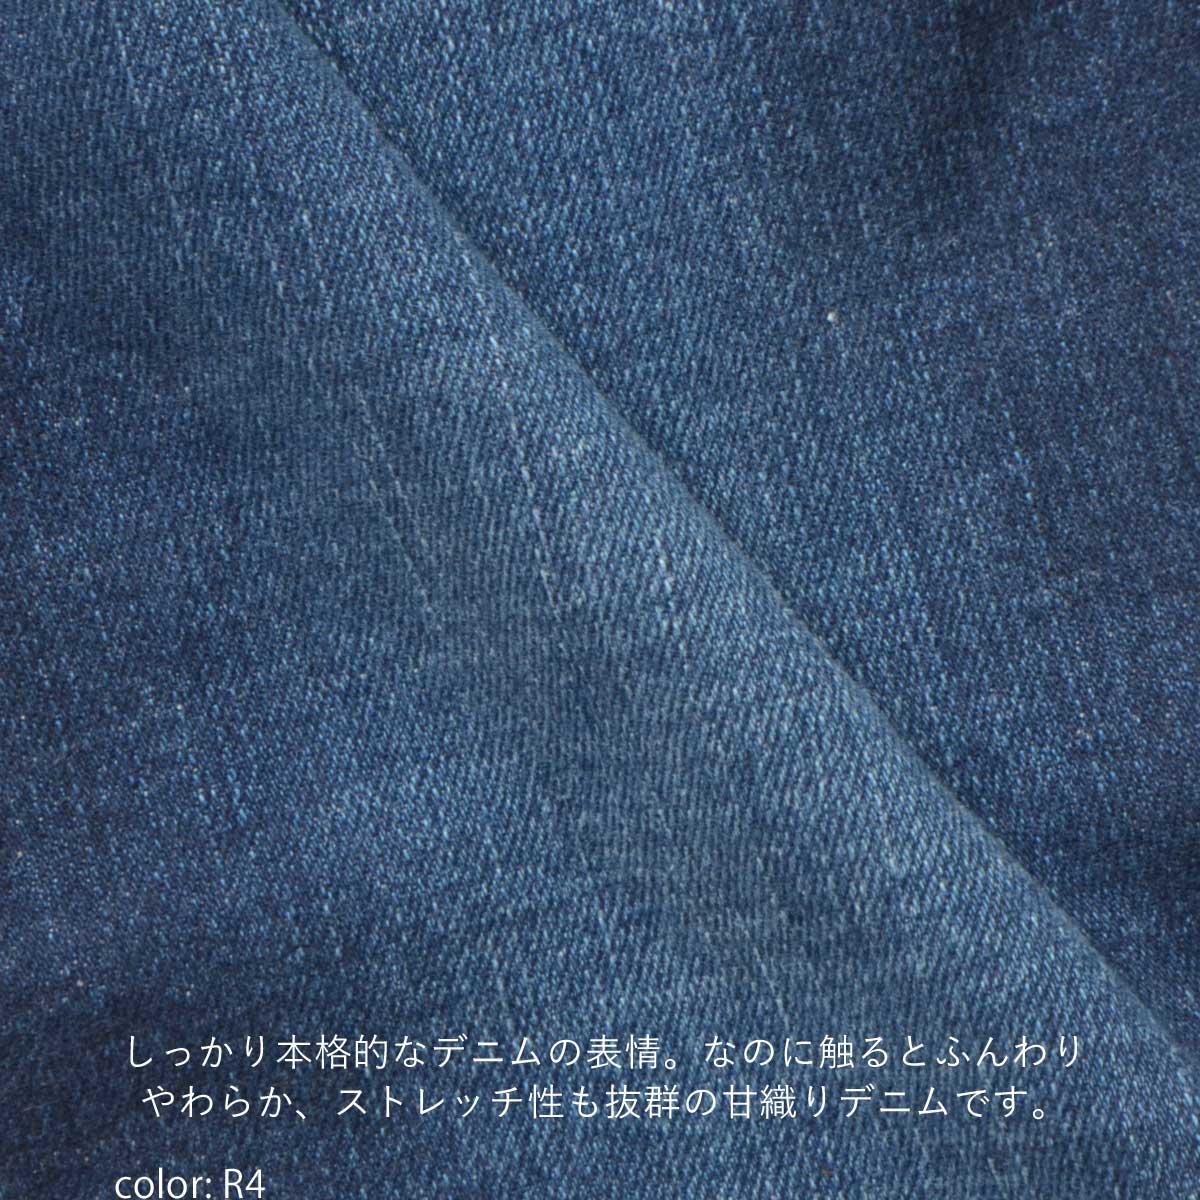 【SALE】Cafetty CFロゴカーヴィーテーパード CF0350